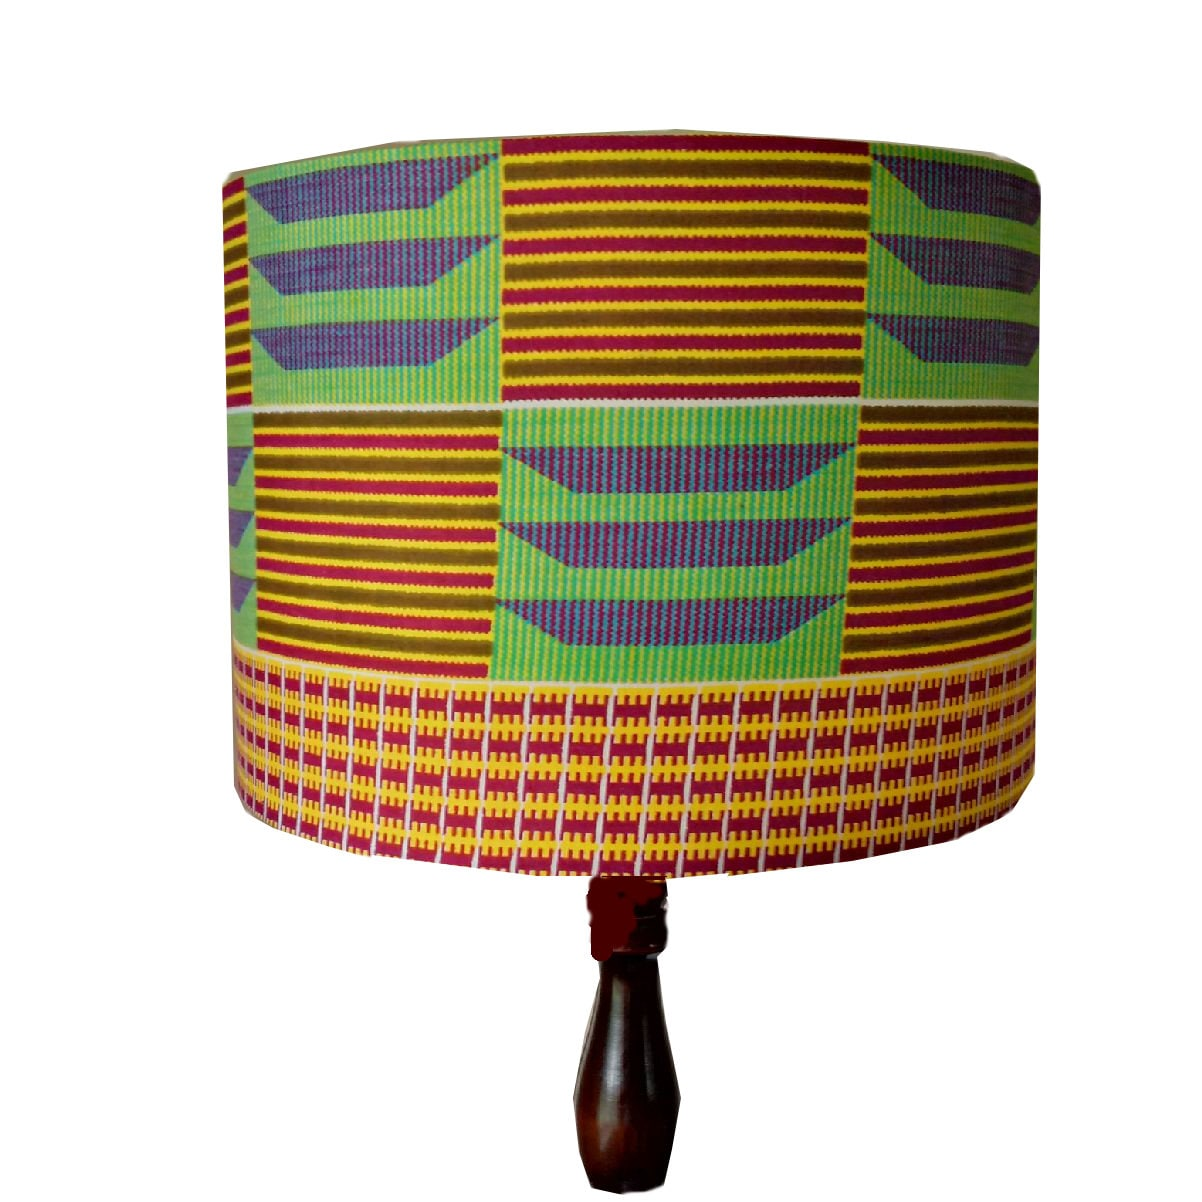 Seconds Geometric African Kente Lampshade Mid Century Modern Lampshade 30cm Drum Lamp Shade African Home Decor Gift Detolaandgeek